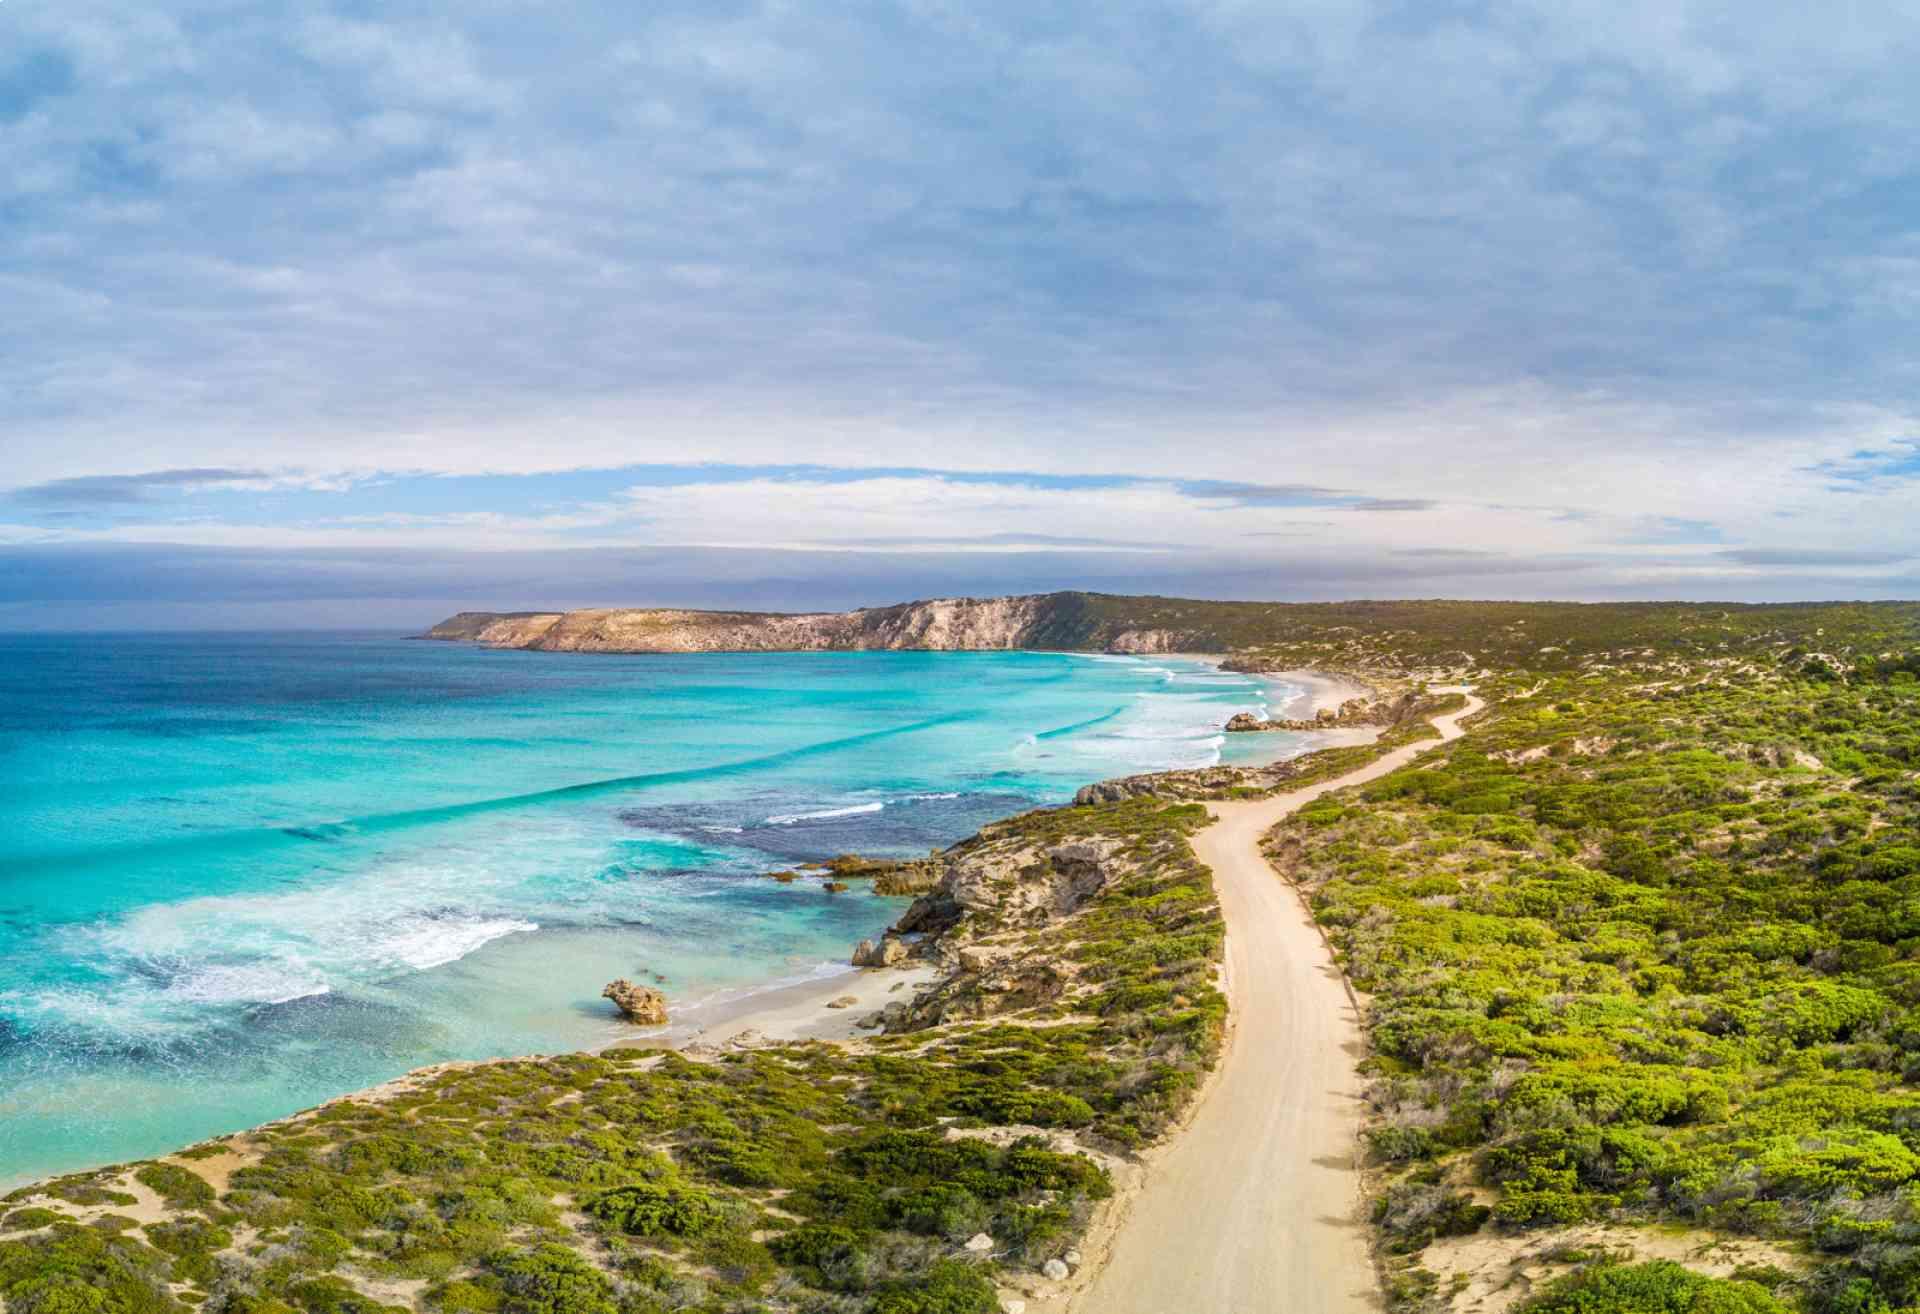 Pennington Bay, Kangaroo Island by Isaac Forman, South Australian Tourism Commission